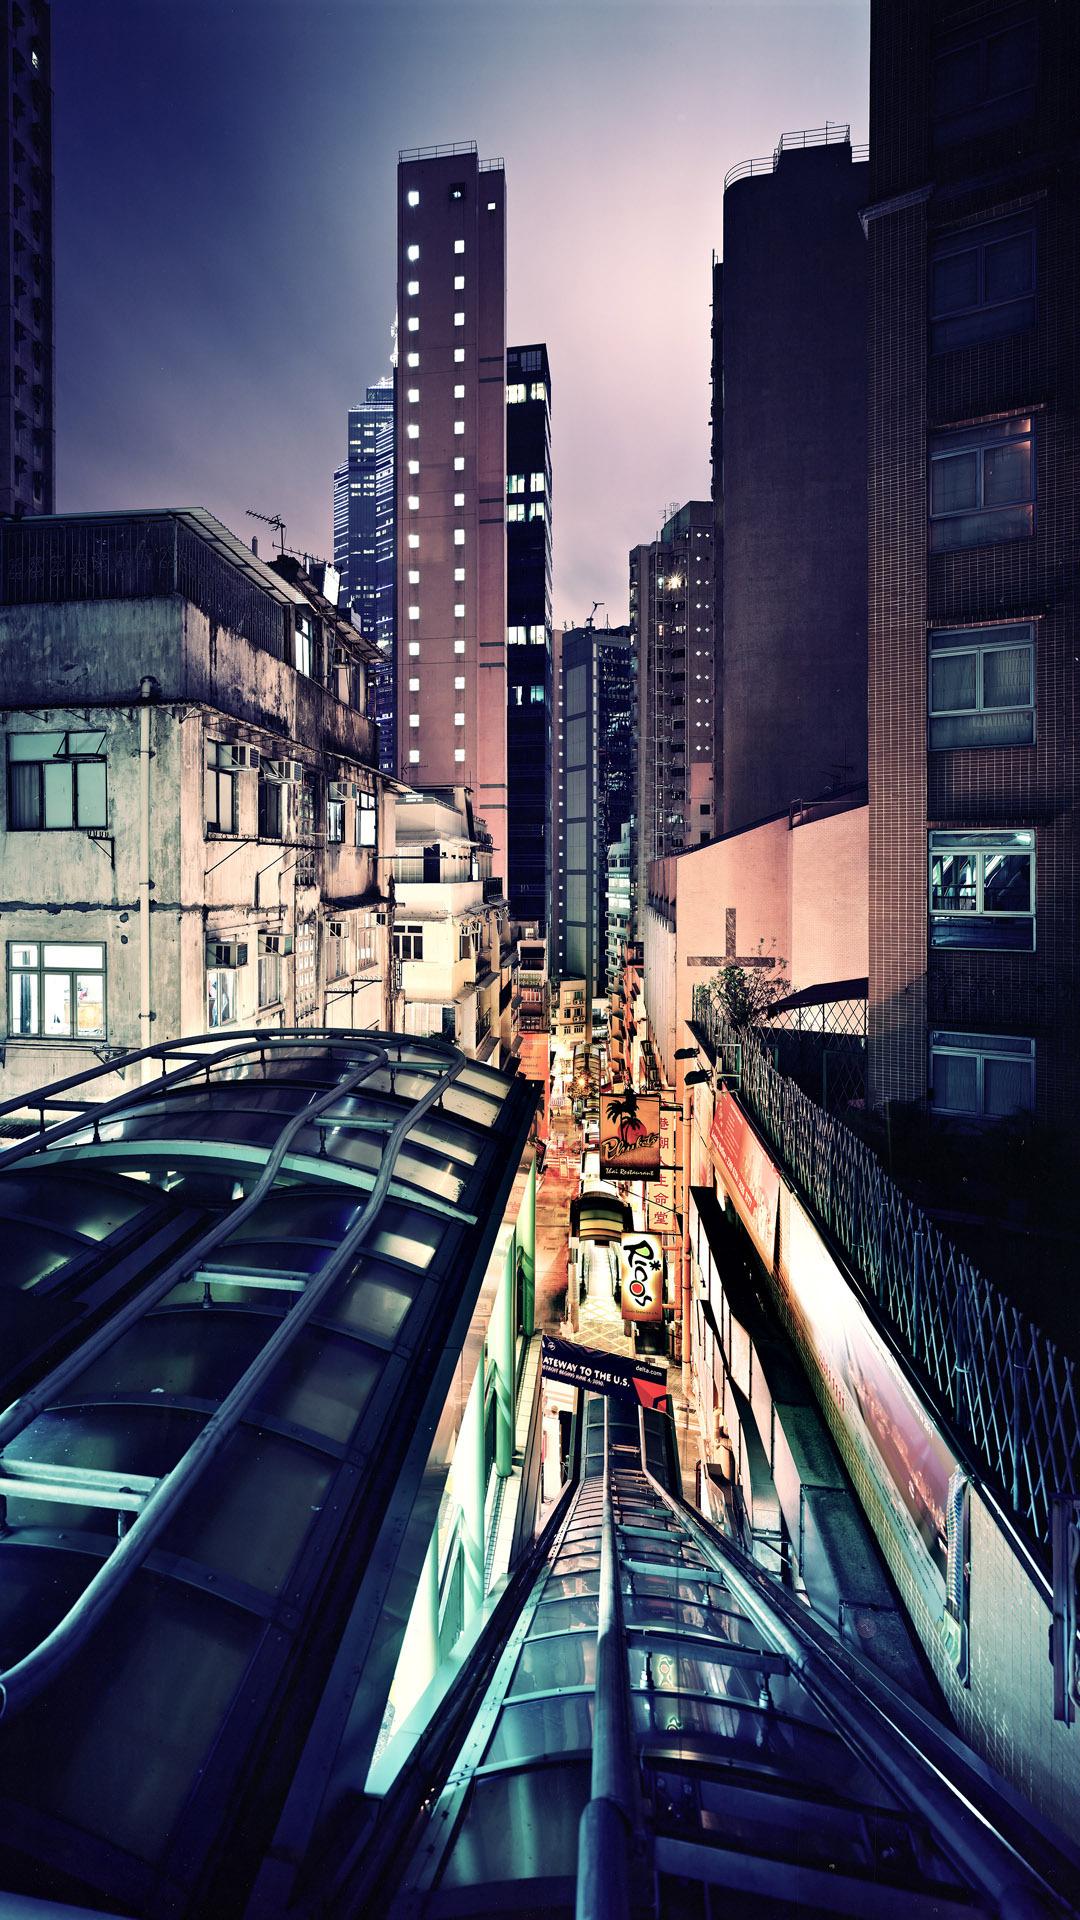 1080x1920 UCA Night Hong Kong wallpaper Donald Williamson 1080x1920